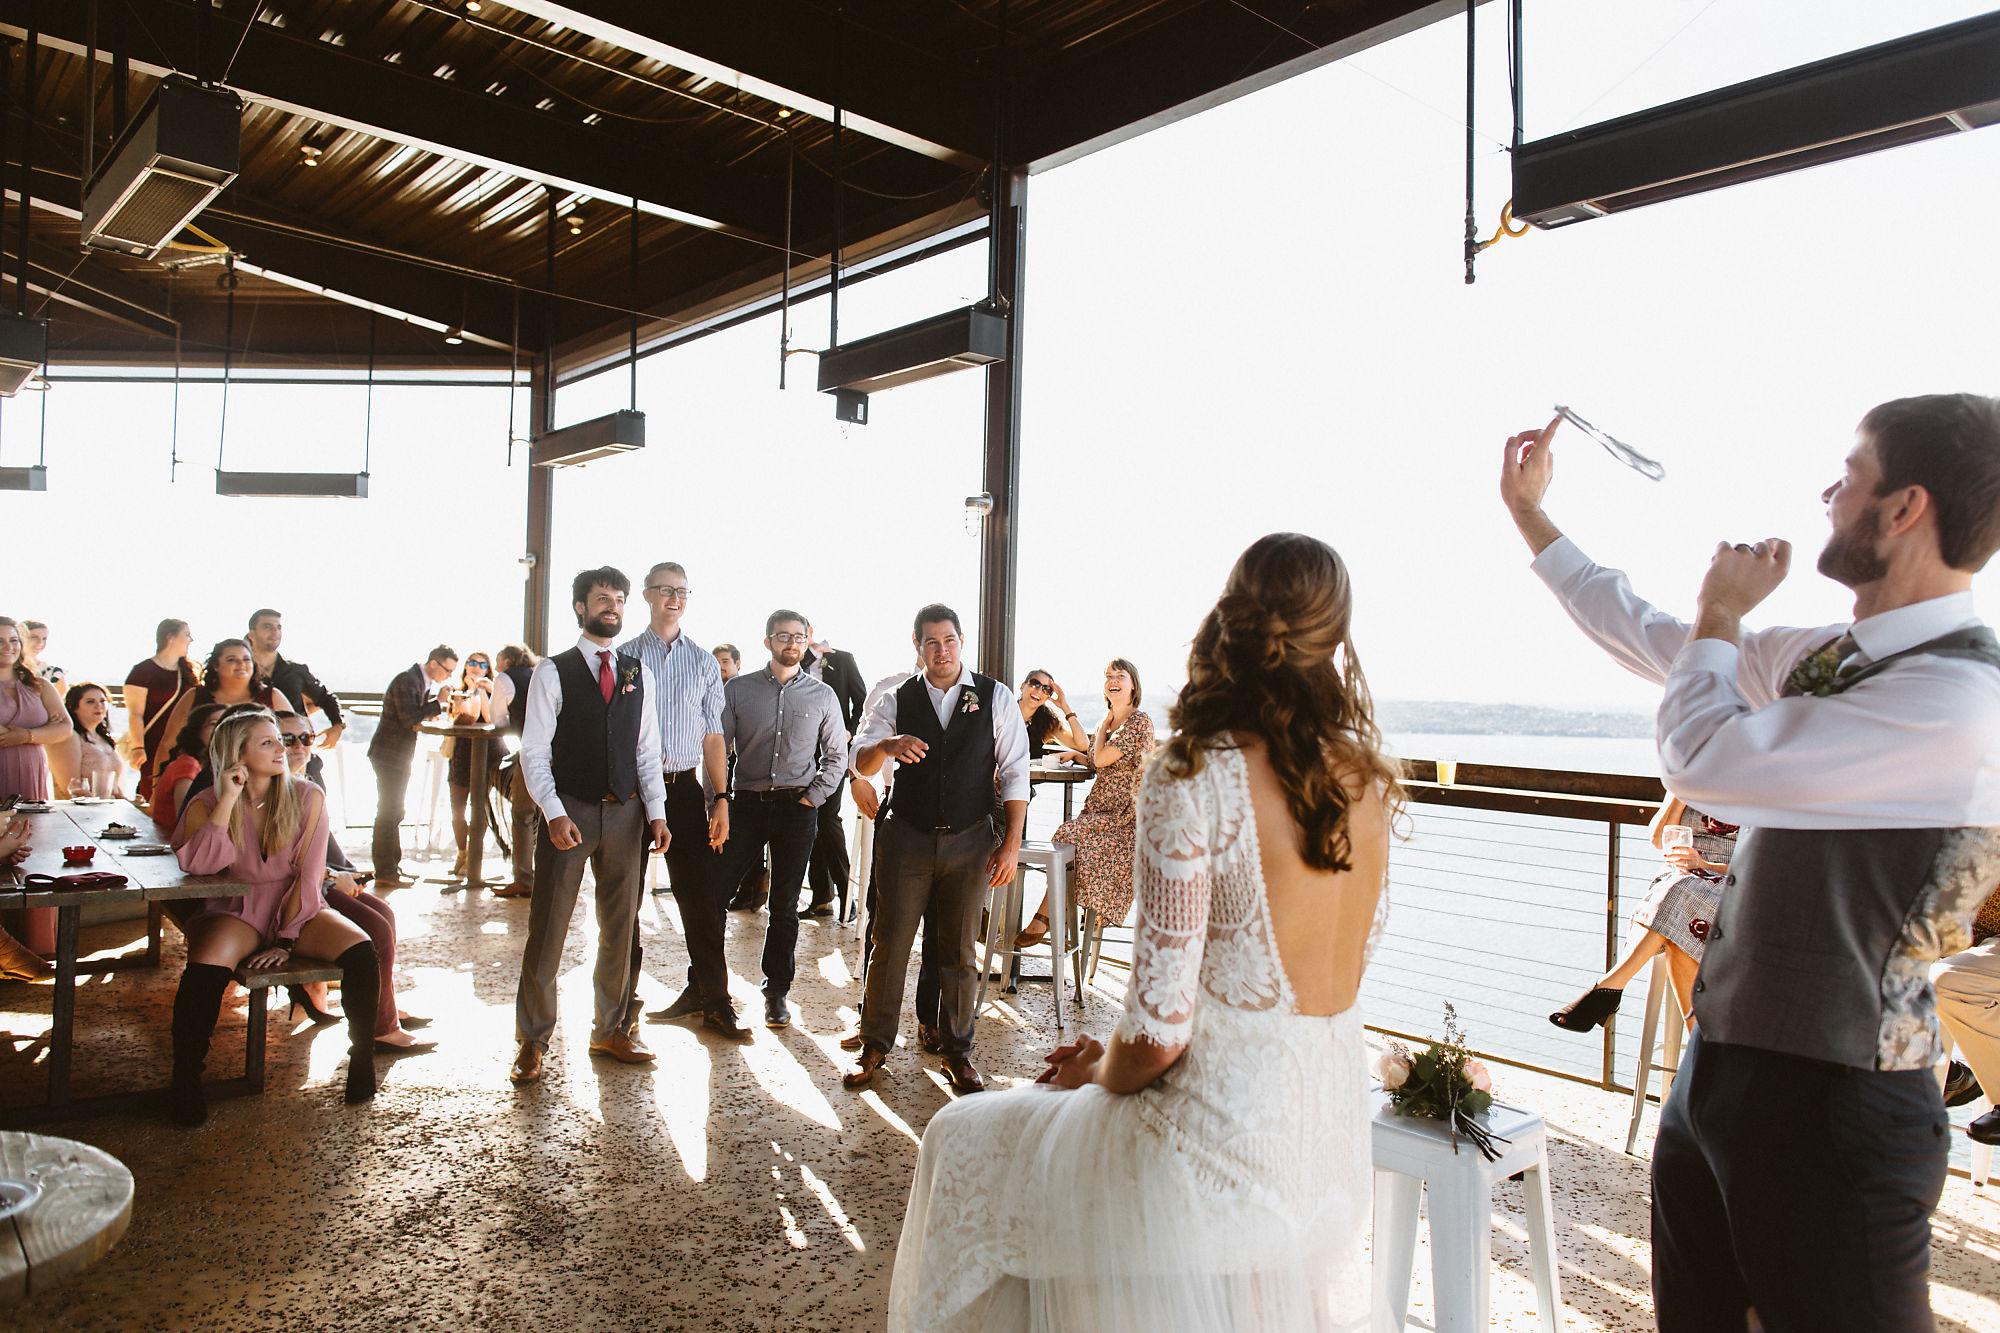 jessica_austin_oasis_brewery_wedding_photos162209.jpg